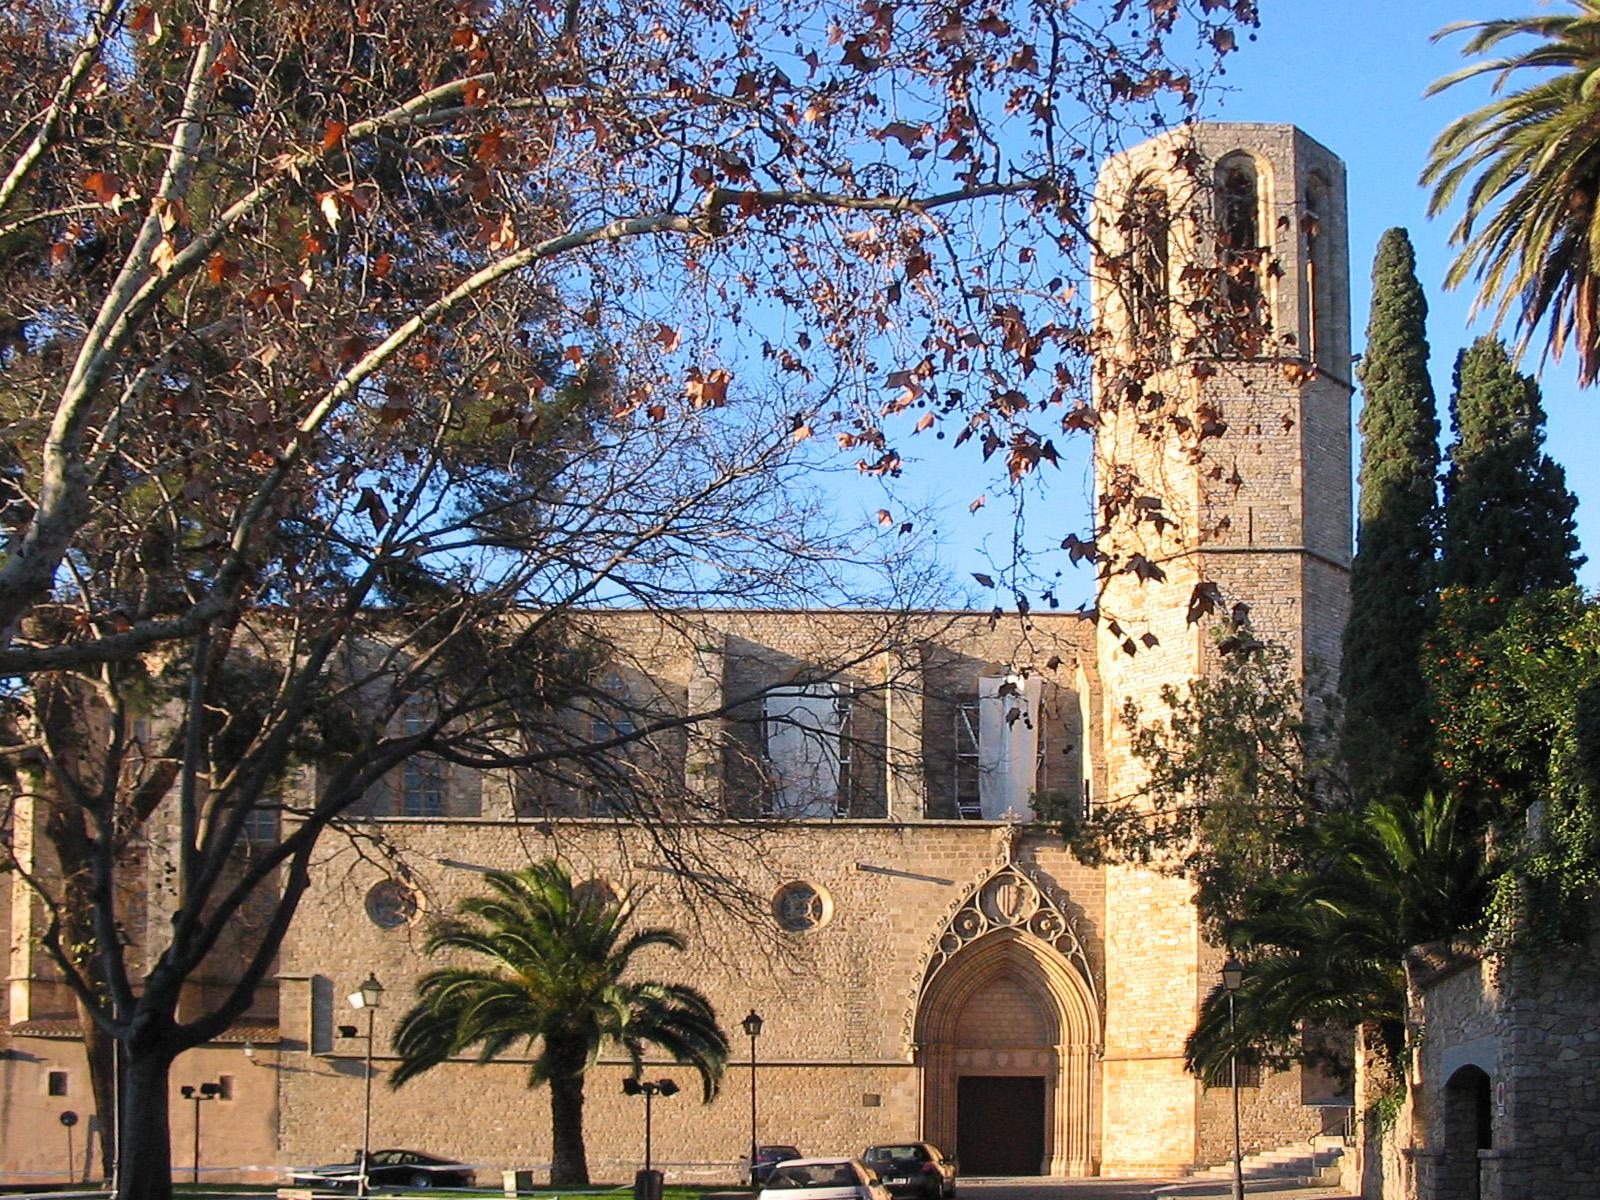 File:Barcelona Monestir de Pedralbes4.JPG - Wikimedia Commons